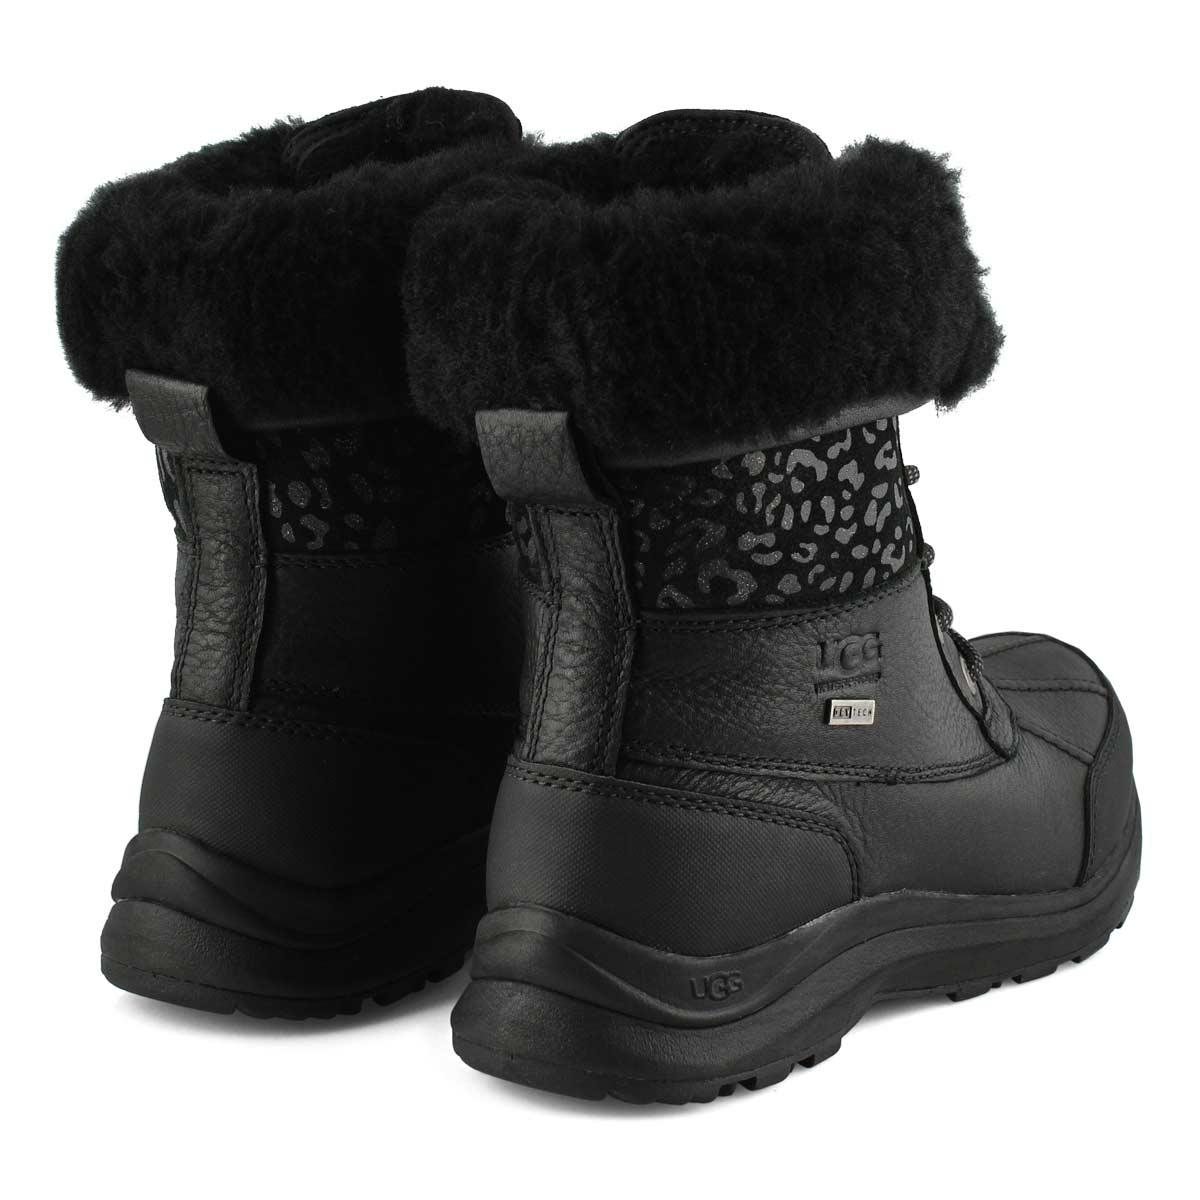 Bottes ADIRONDACKIII, léopard/neige, noir, femmes